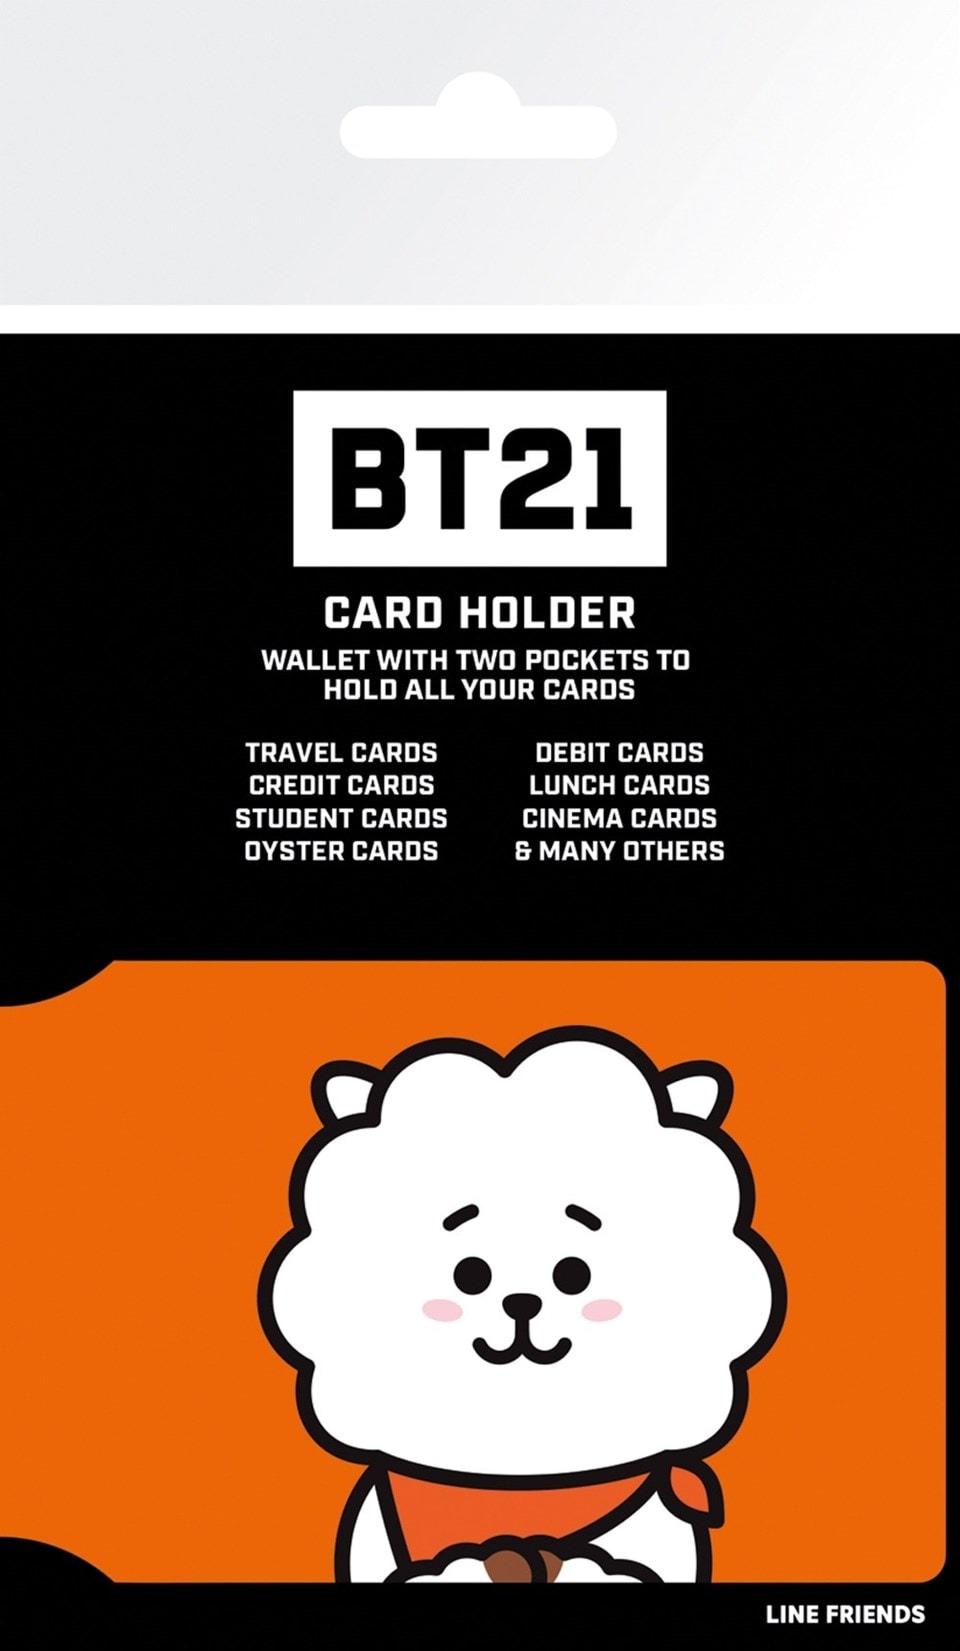 Card Holder BT21: RJ - 1